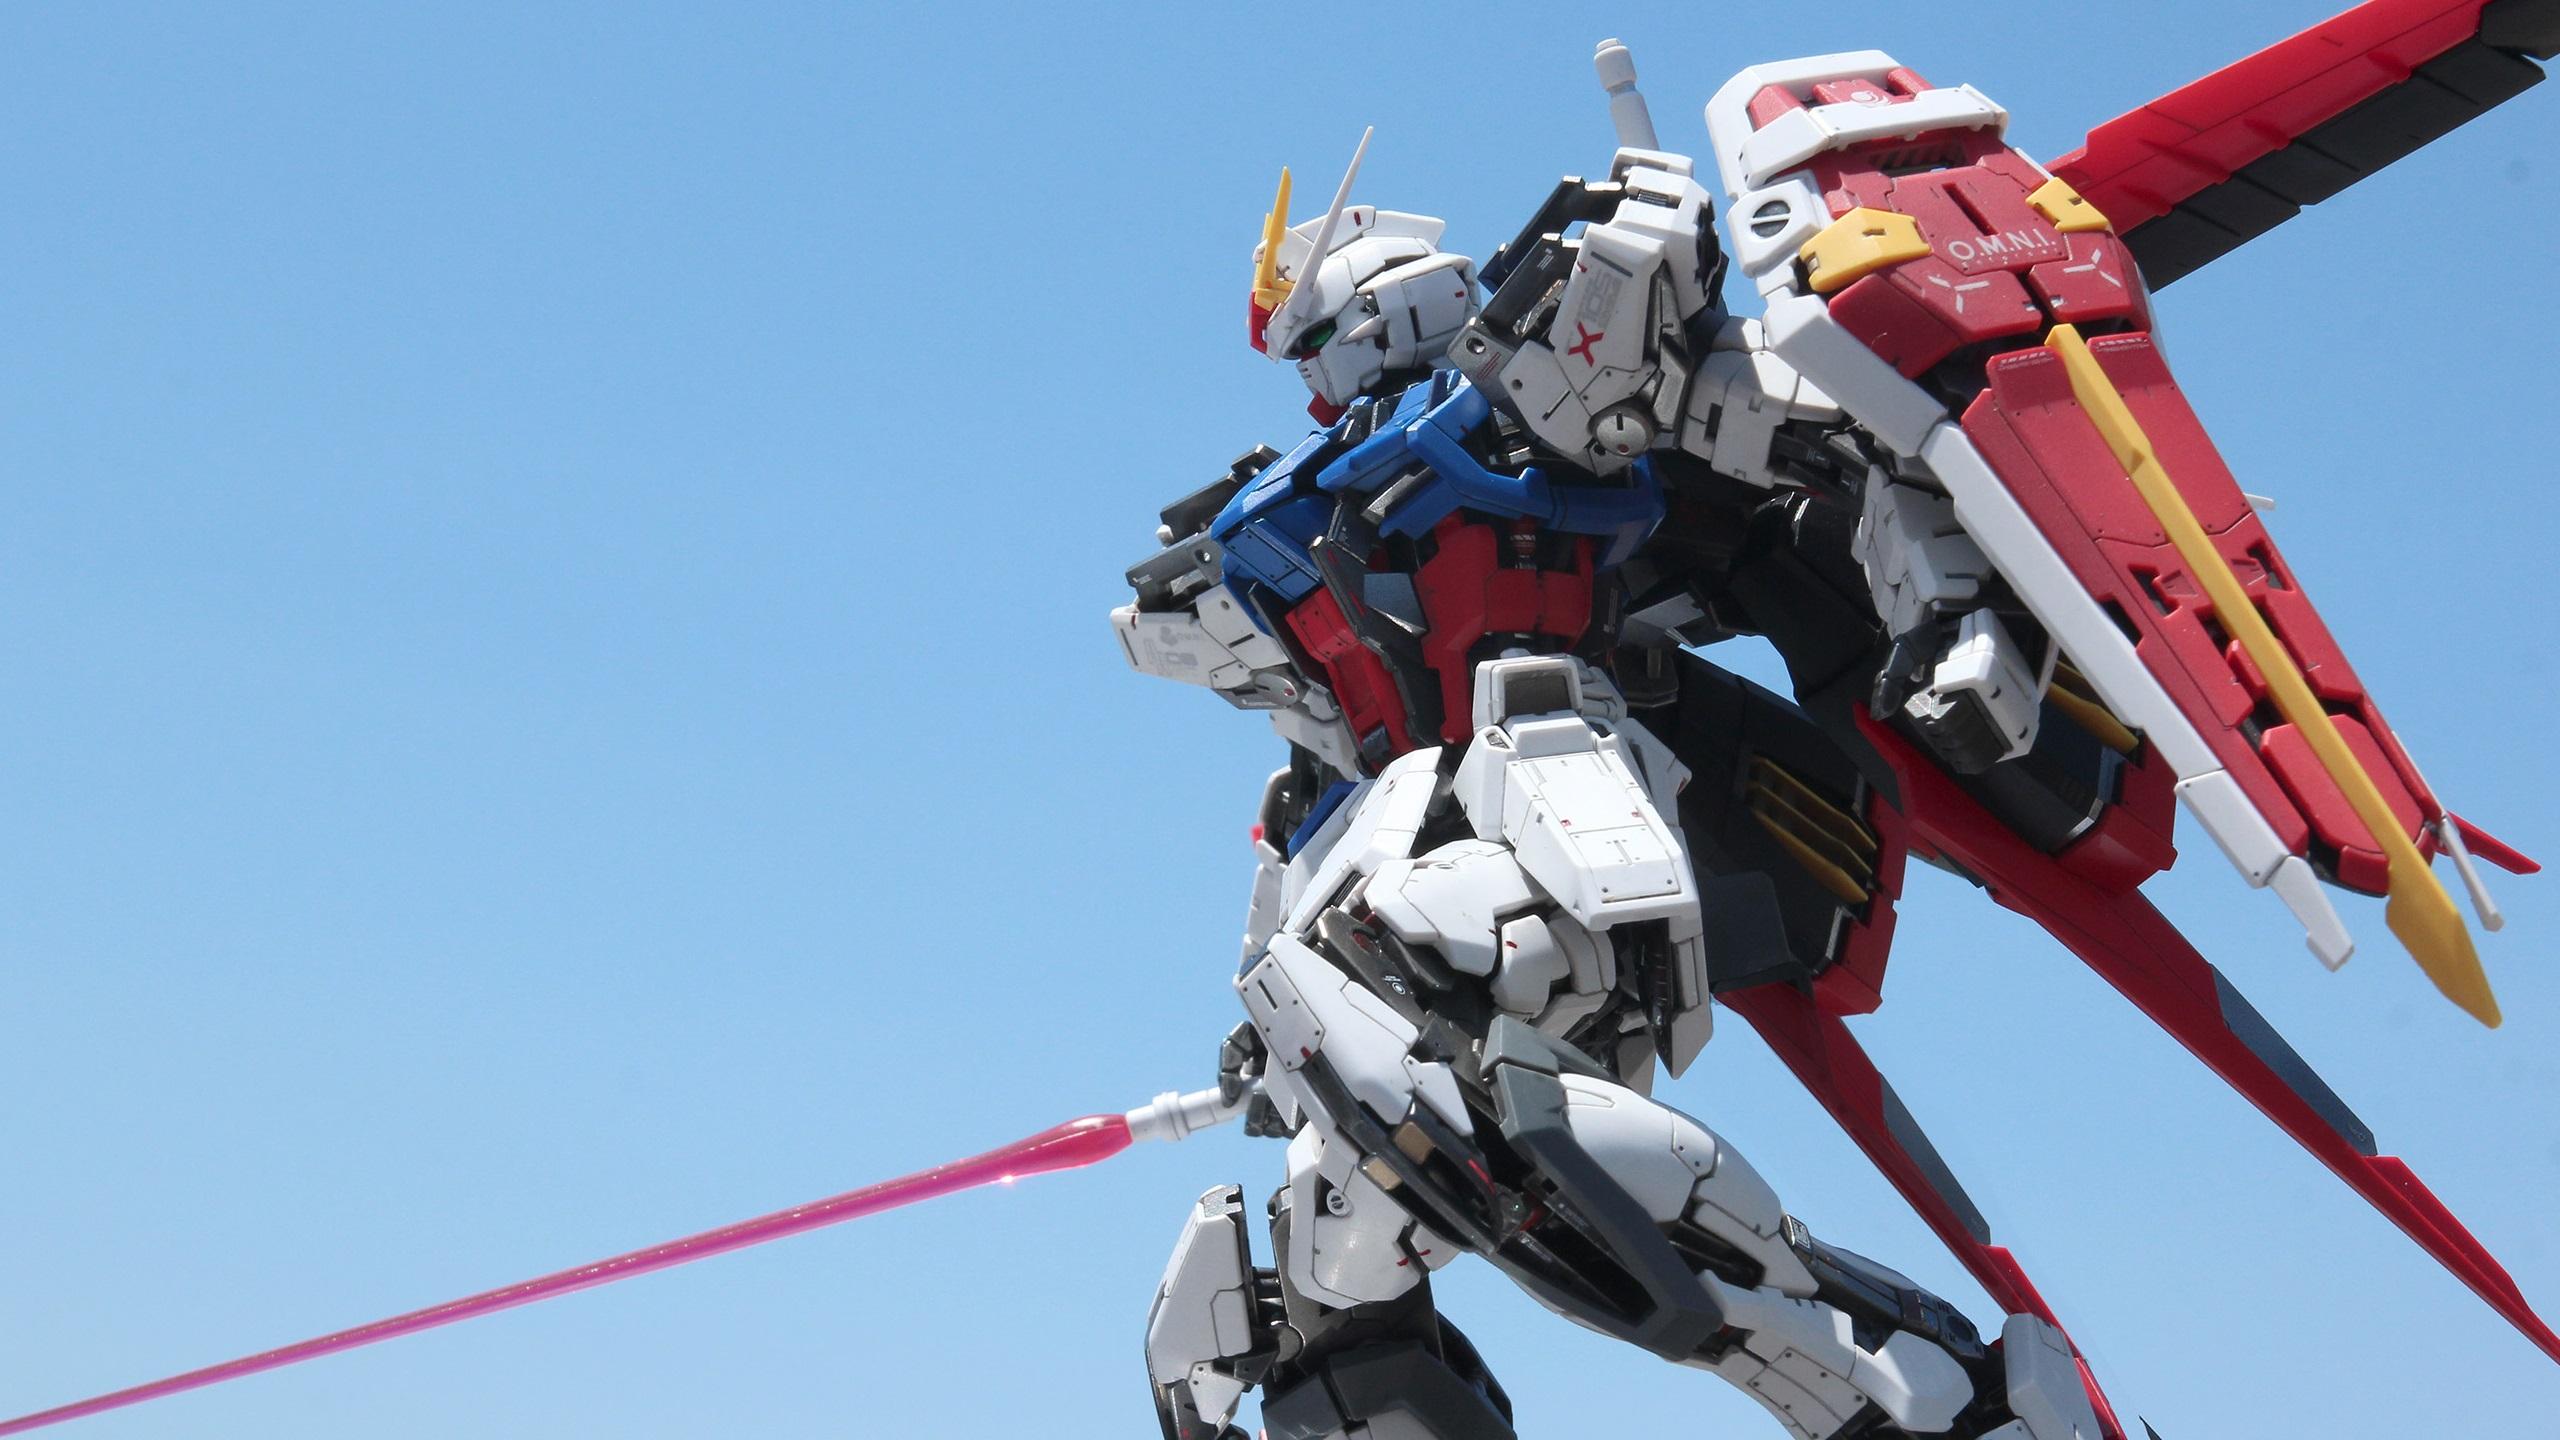 General 2560x1440 Mobile Suit Gundam Gundam Gundam Aile Strike Master Grade mech Josh Darrah Gunpla Mobile Suit Gundam SEED macro photography robot science fiction